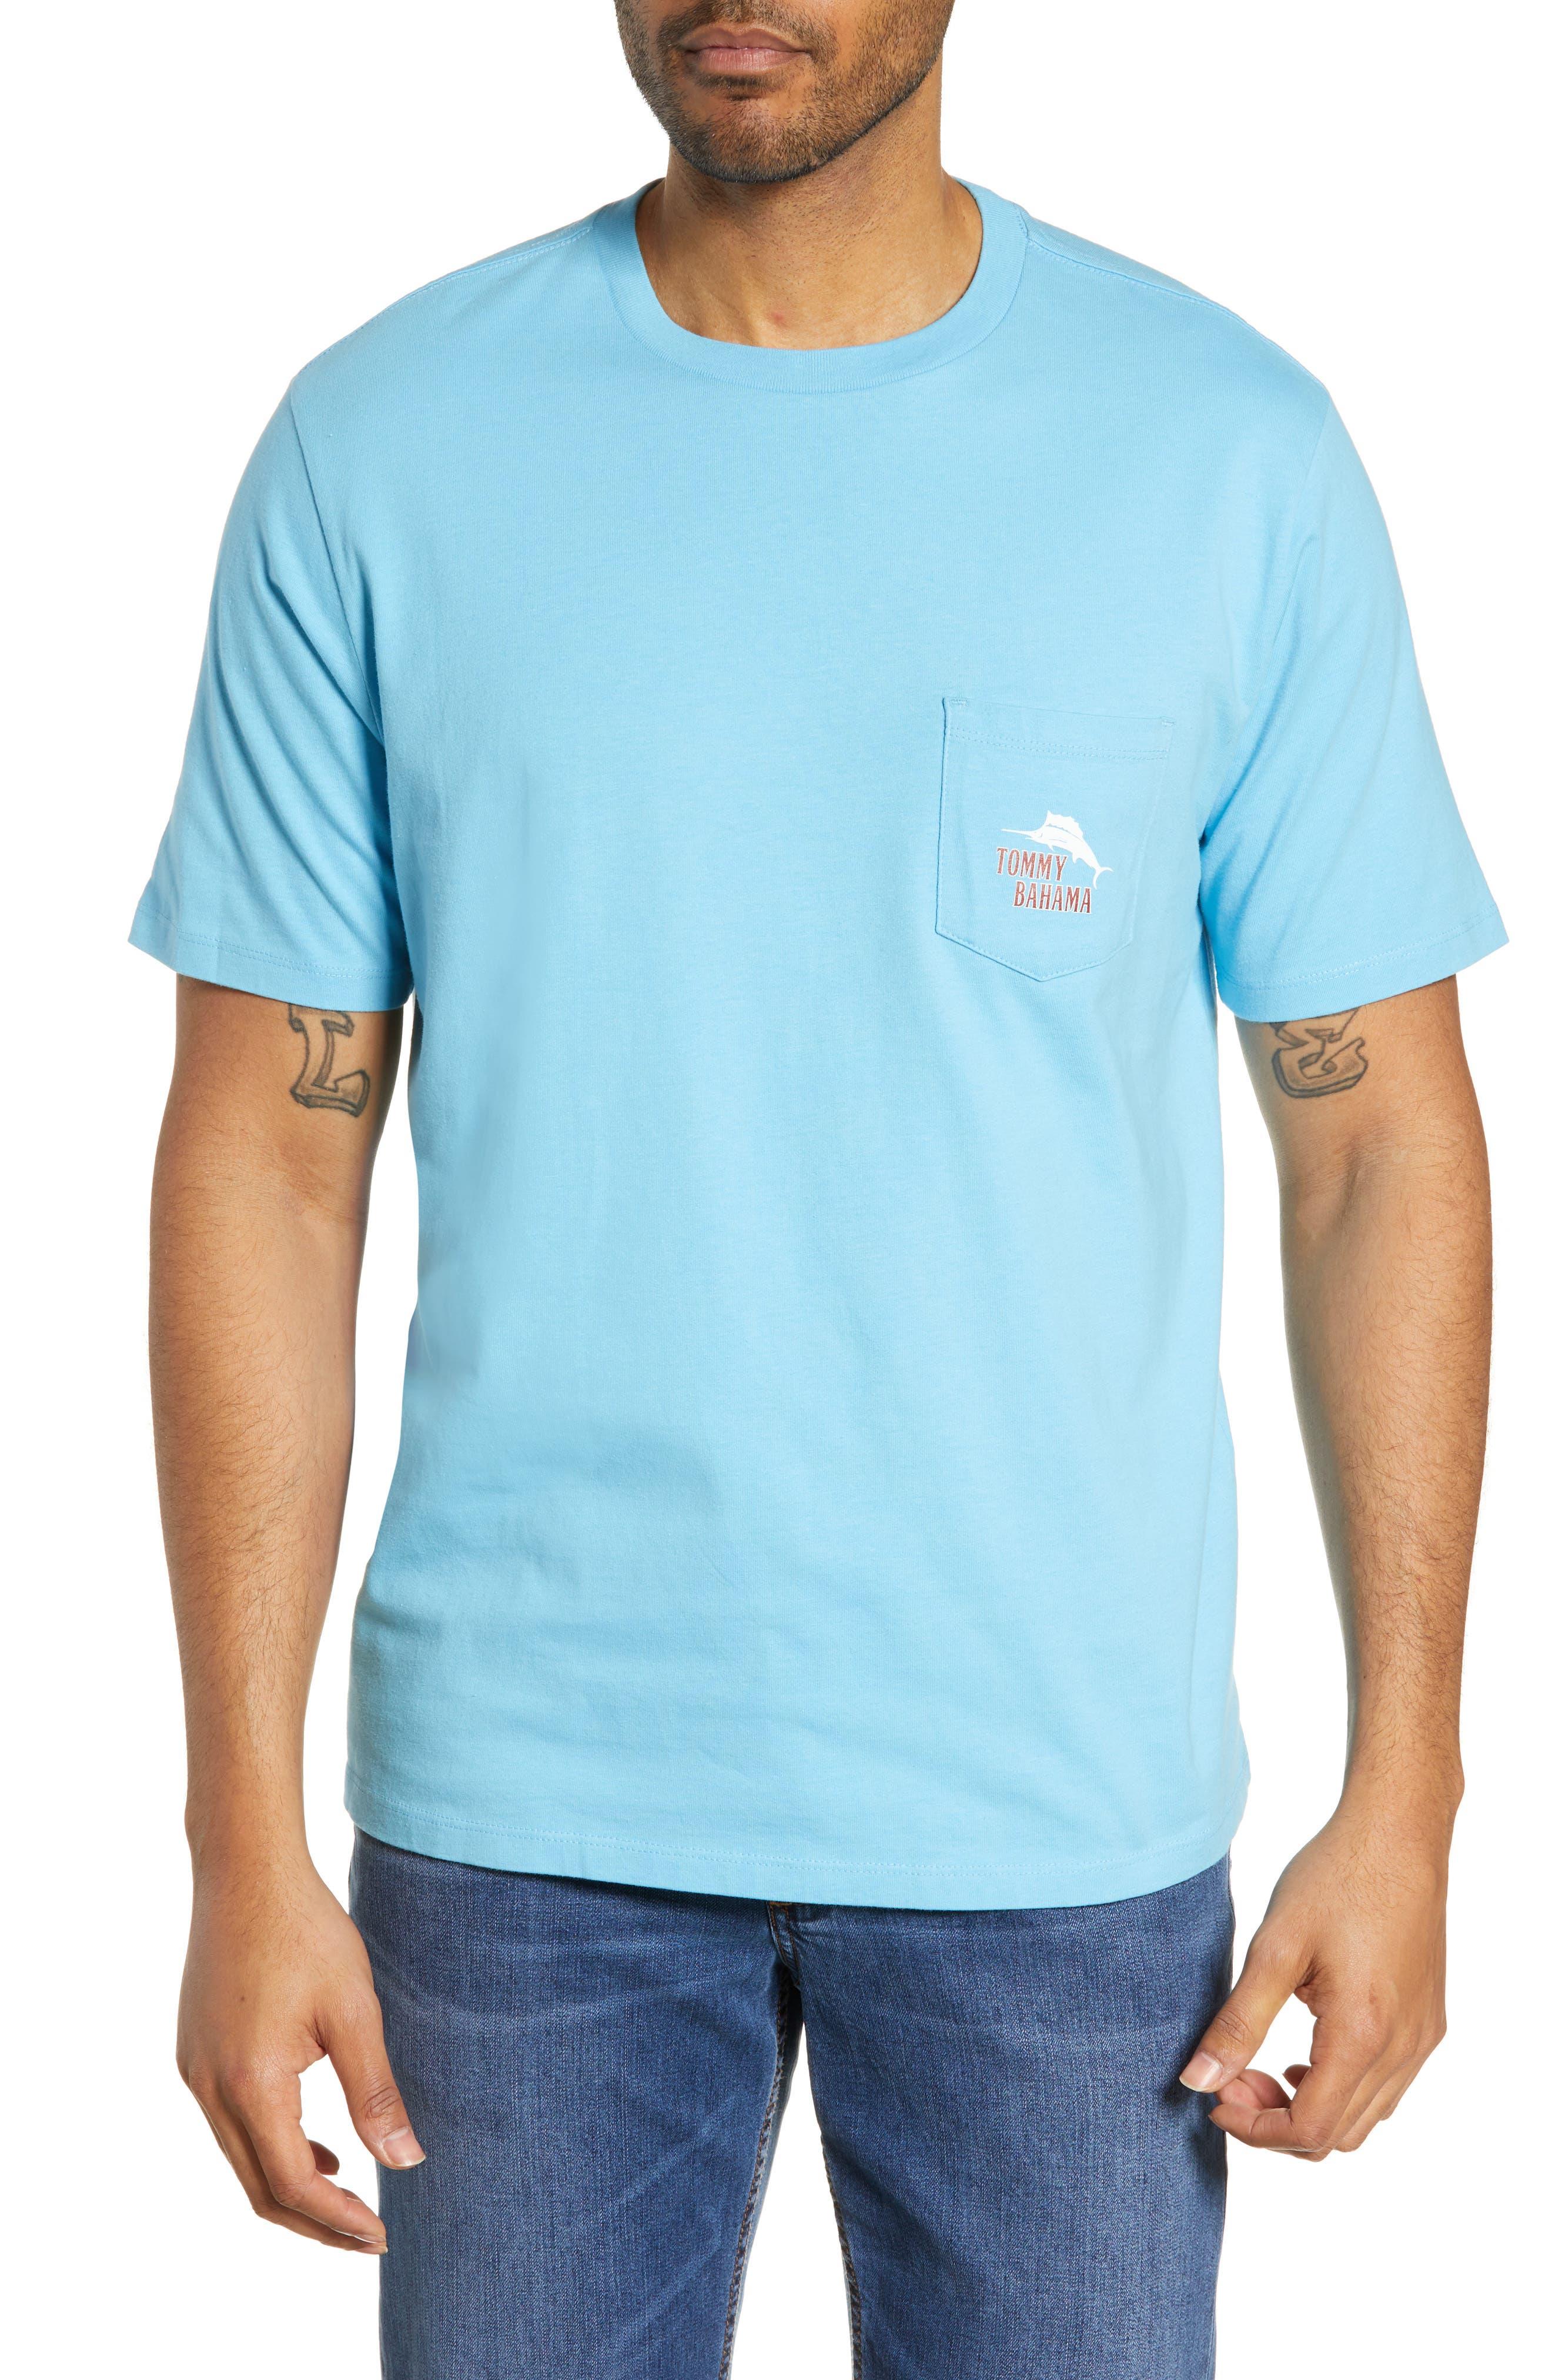 d826c30e Tommy Bahama Long Sleeve T Shirts - DREAMWORKS